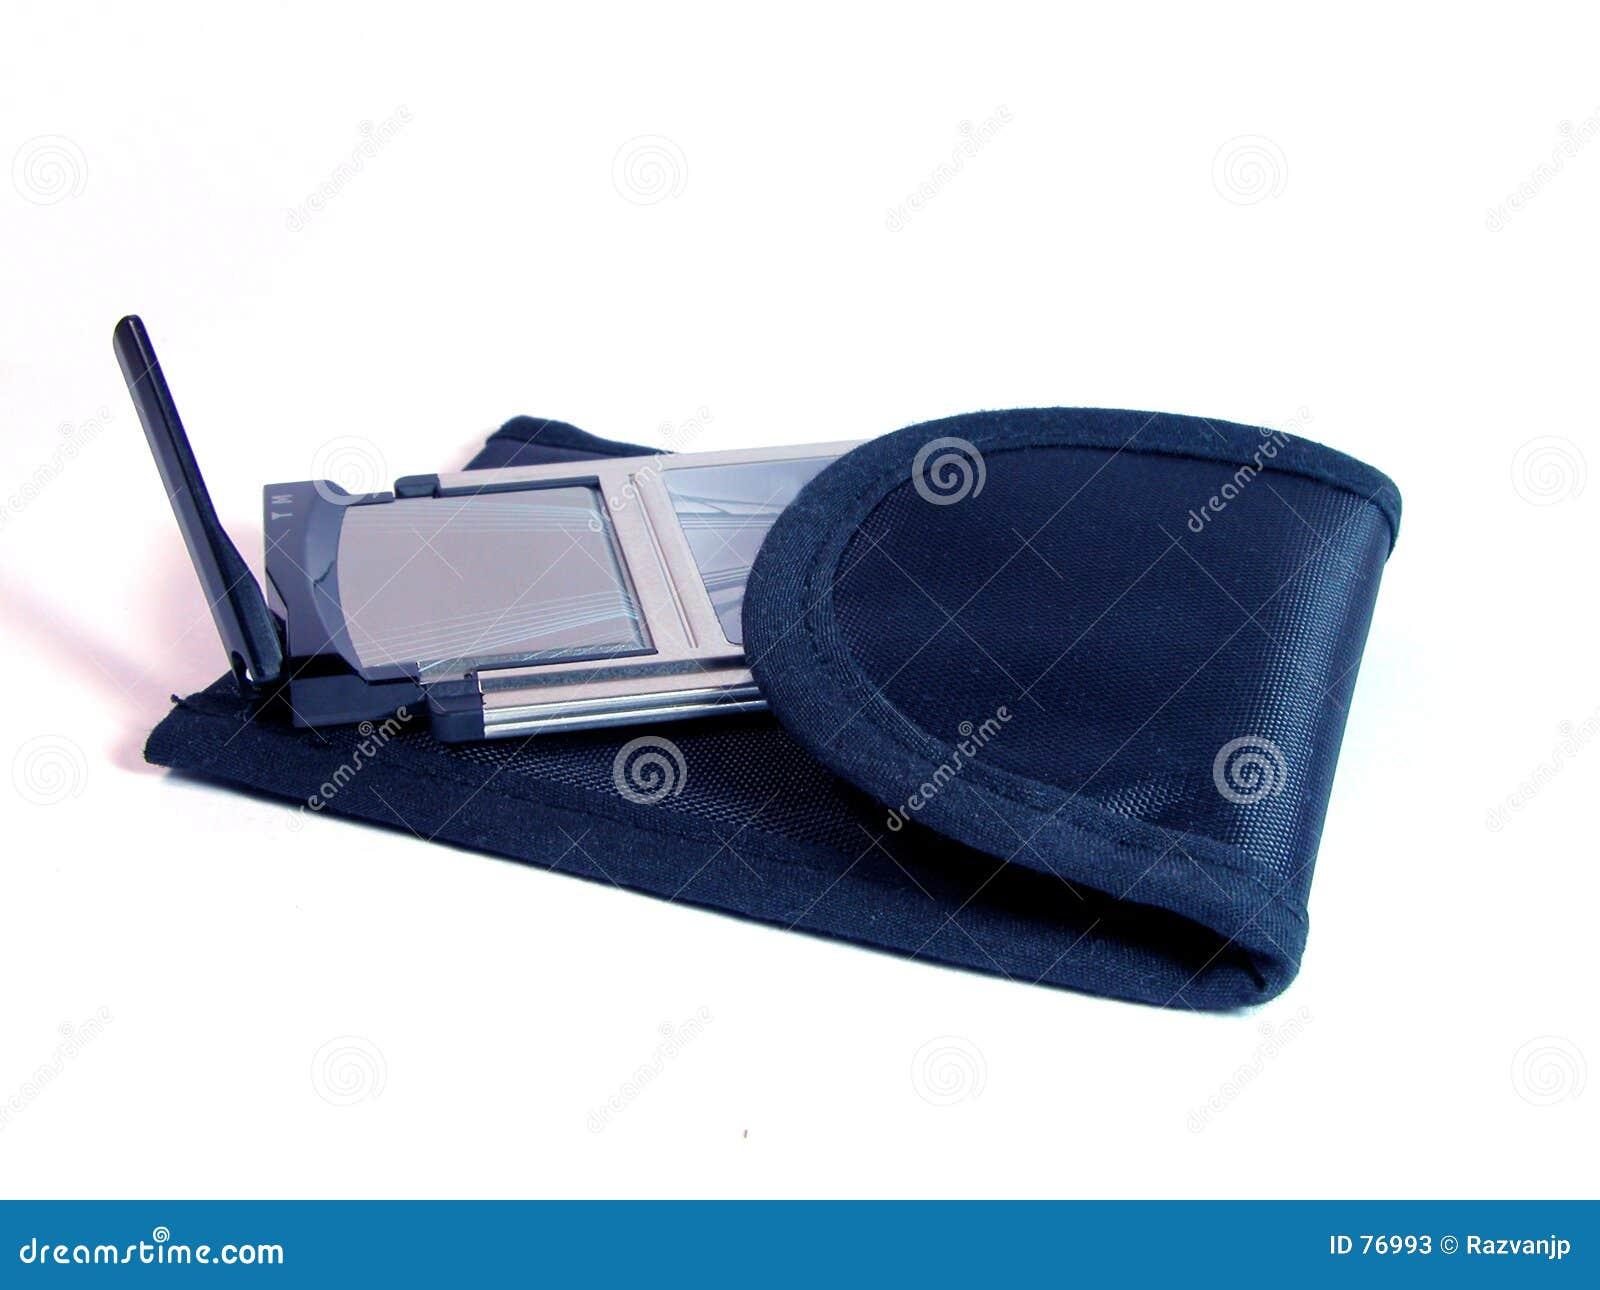 Wireless internet card